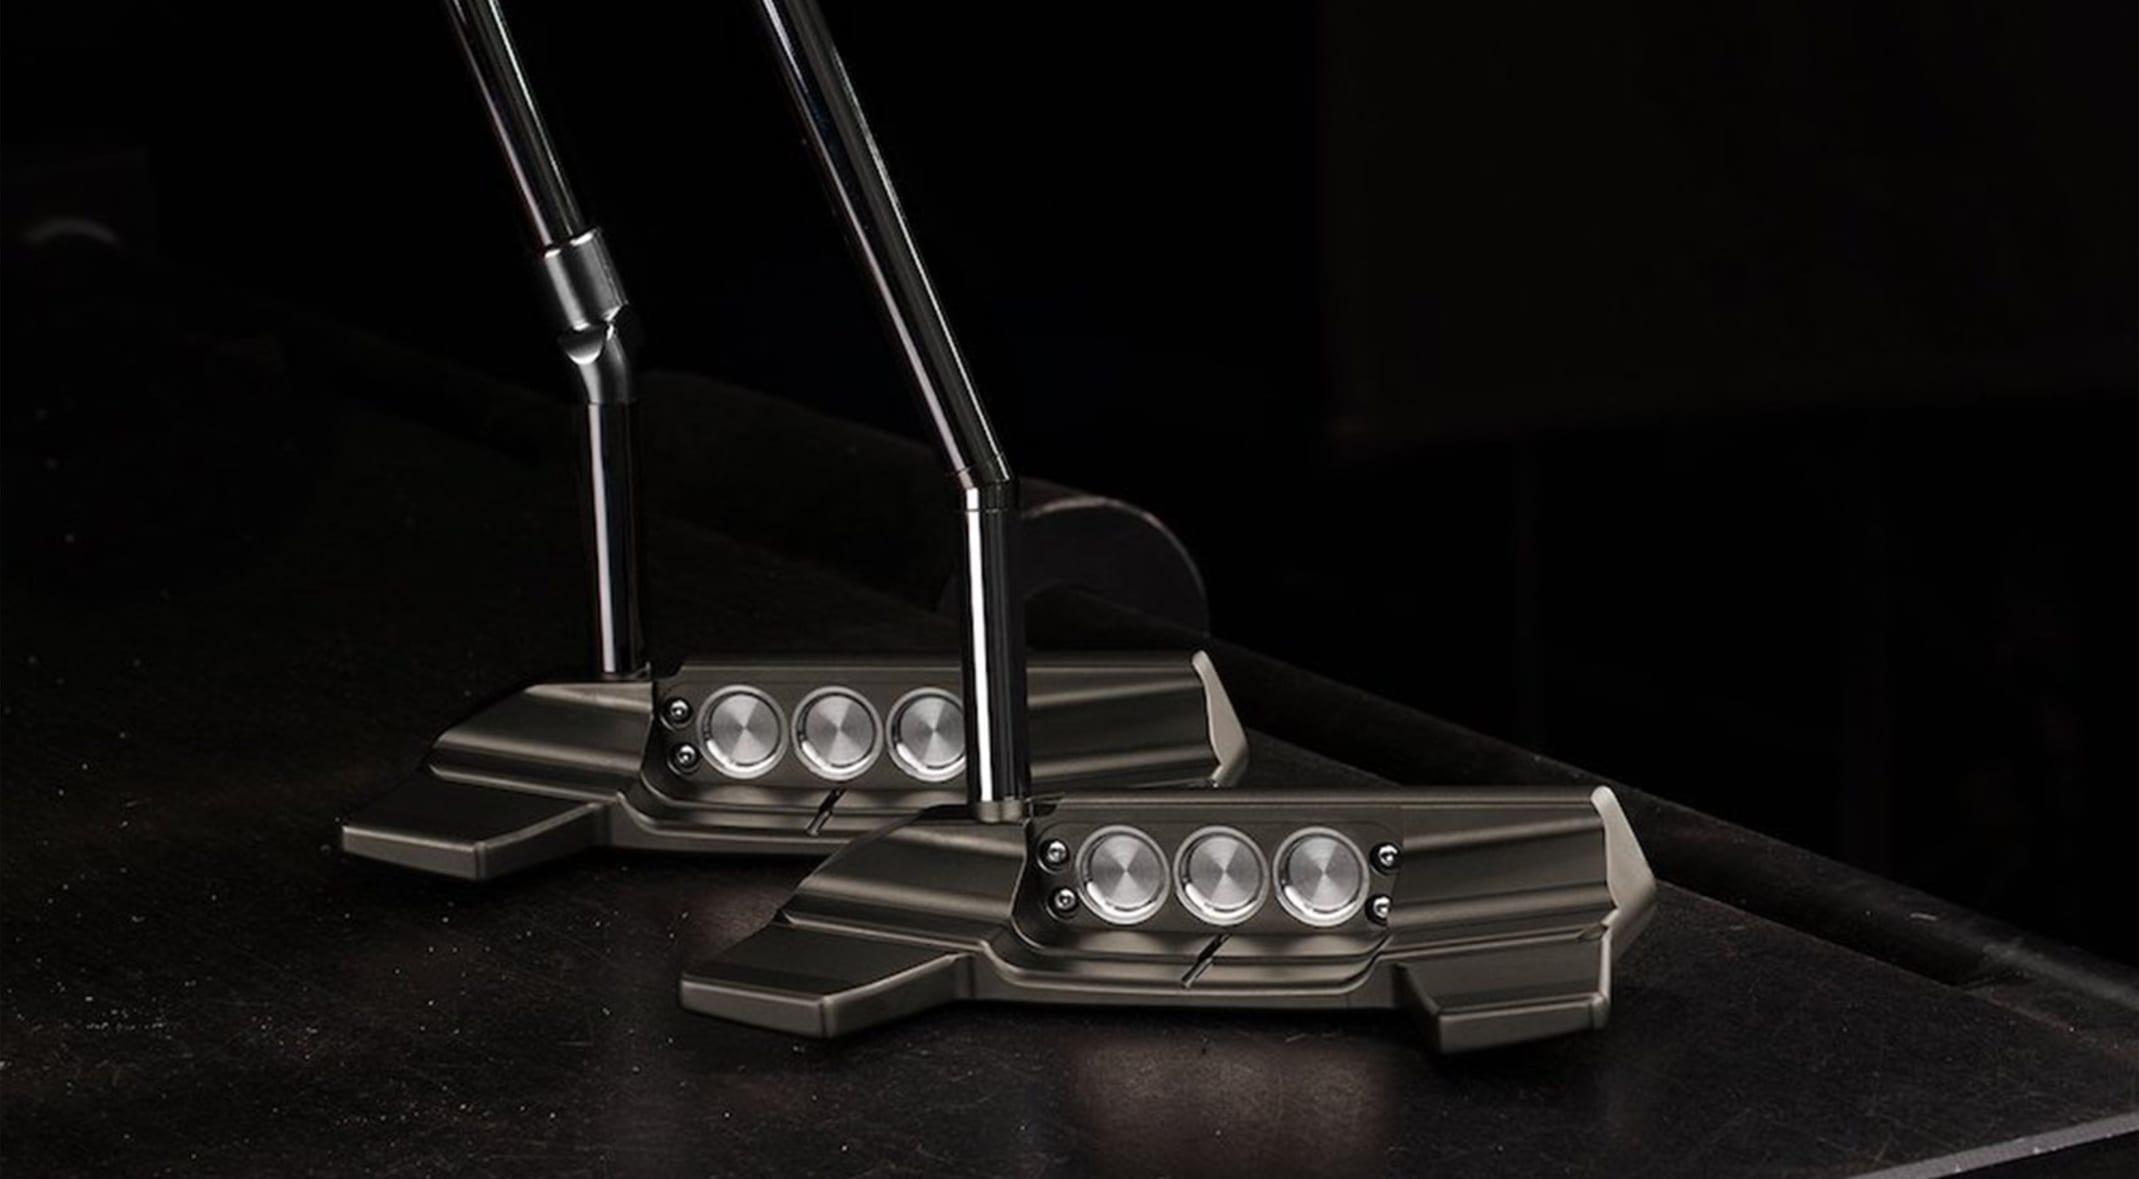 Scotty Cameron introduces Concept X putter line